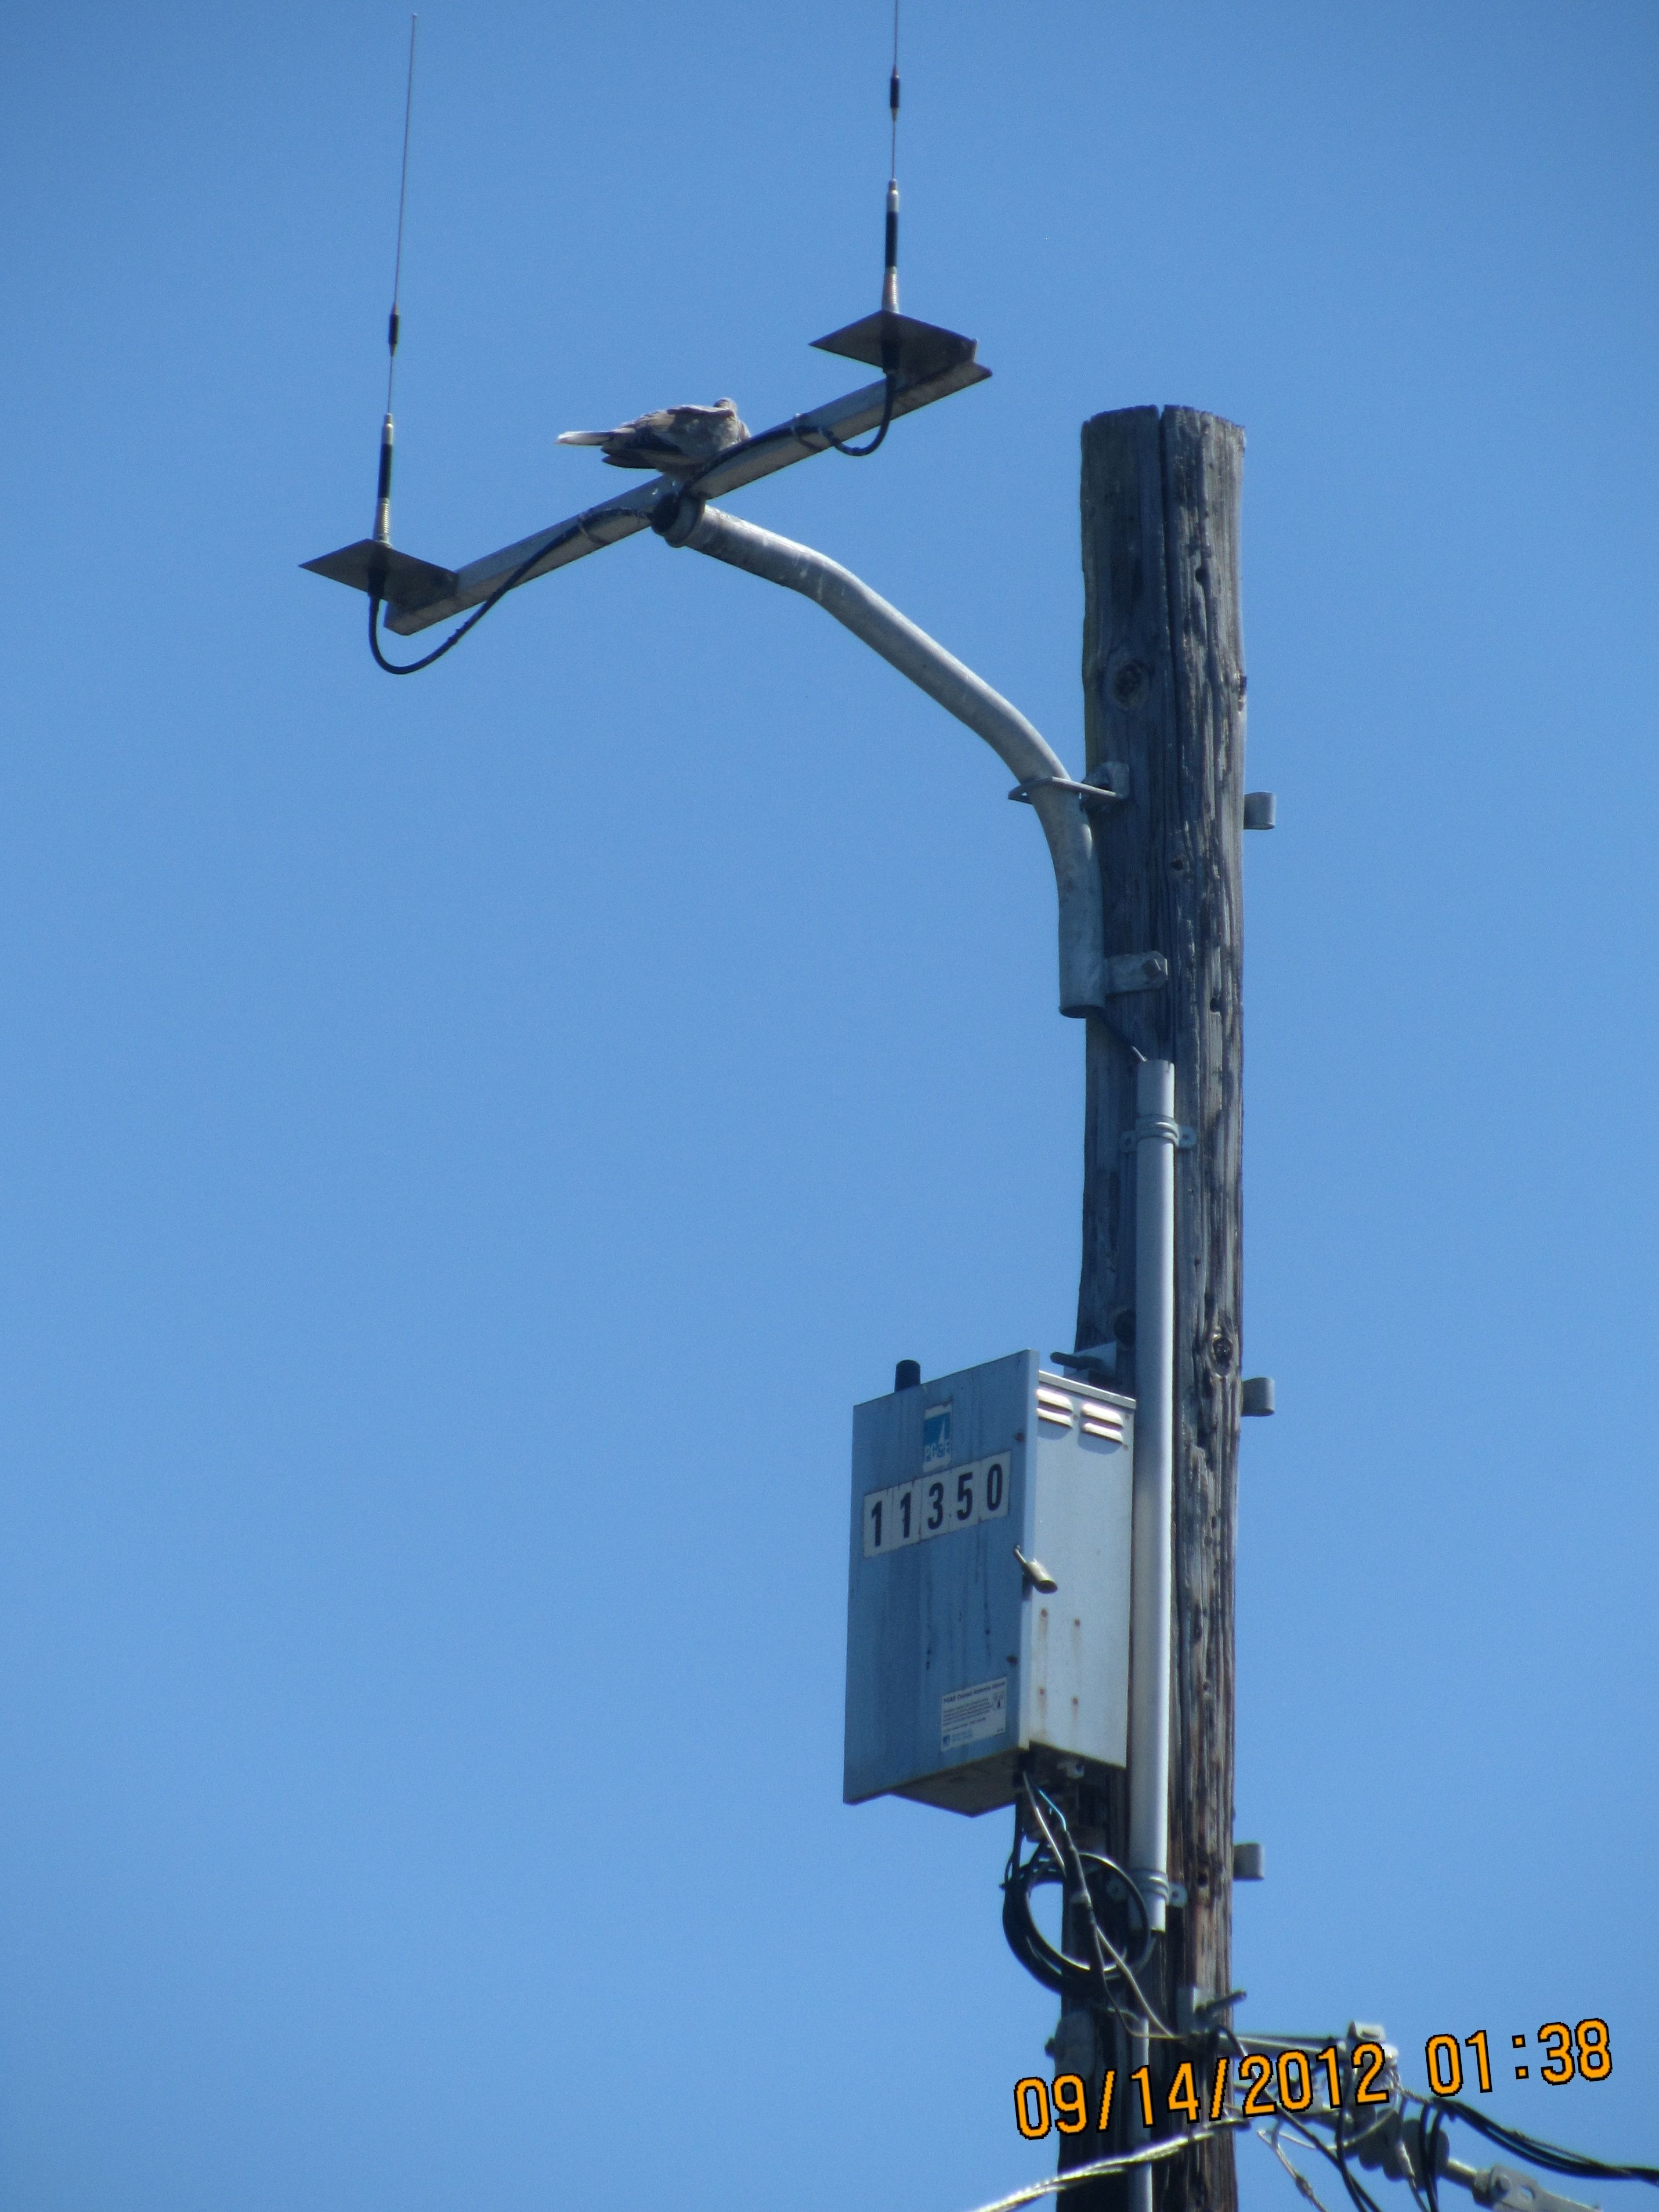 Smart Meter Infrastructure Emf Safety Network